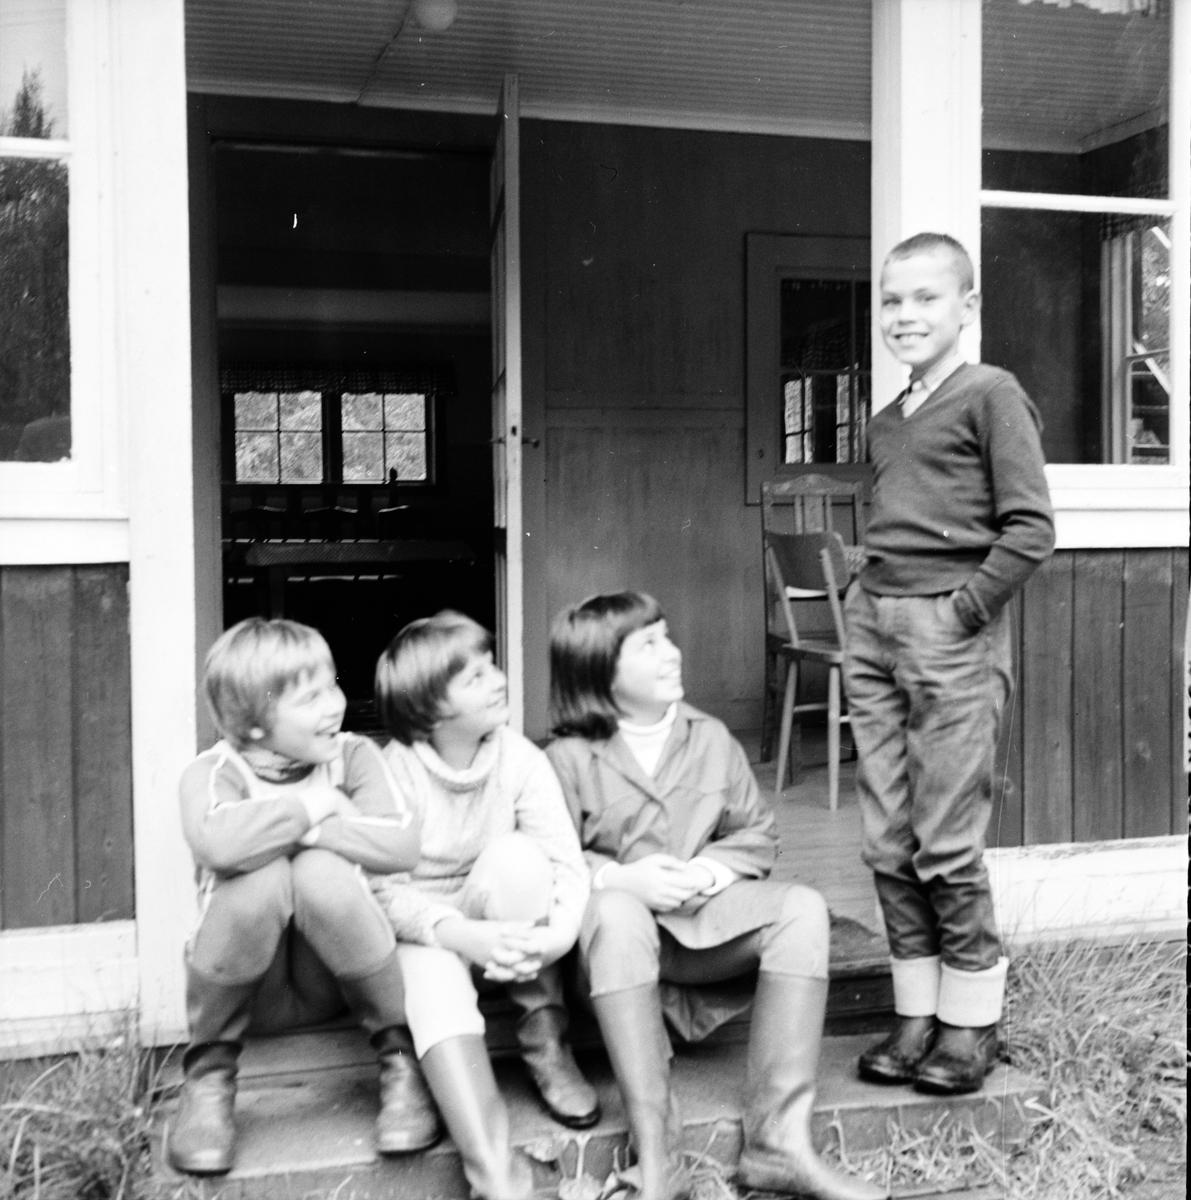 Trollbo koloni öppnas, 17 Juni 1965